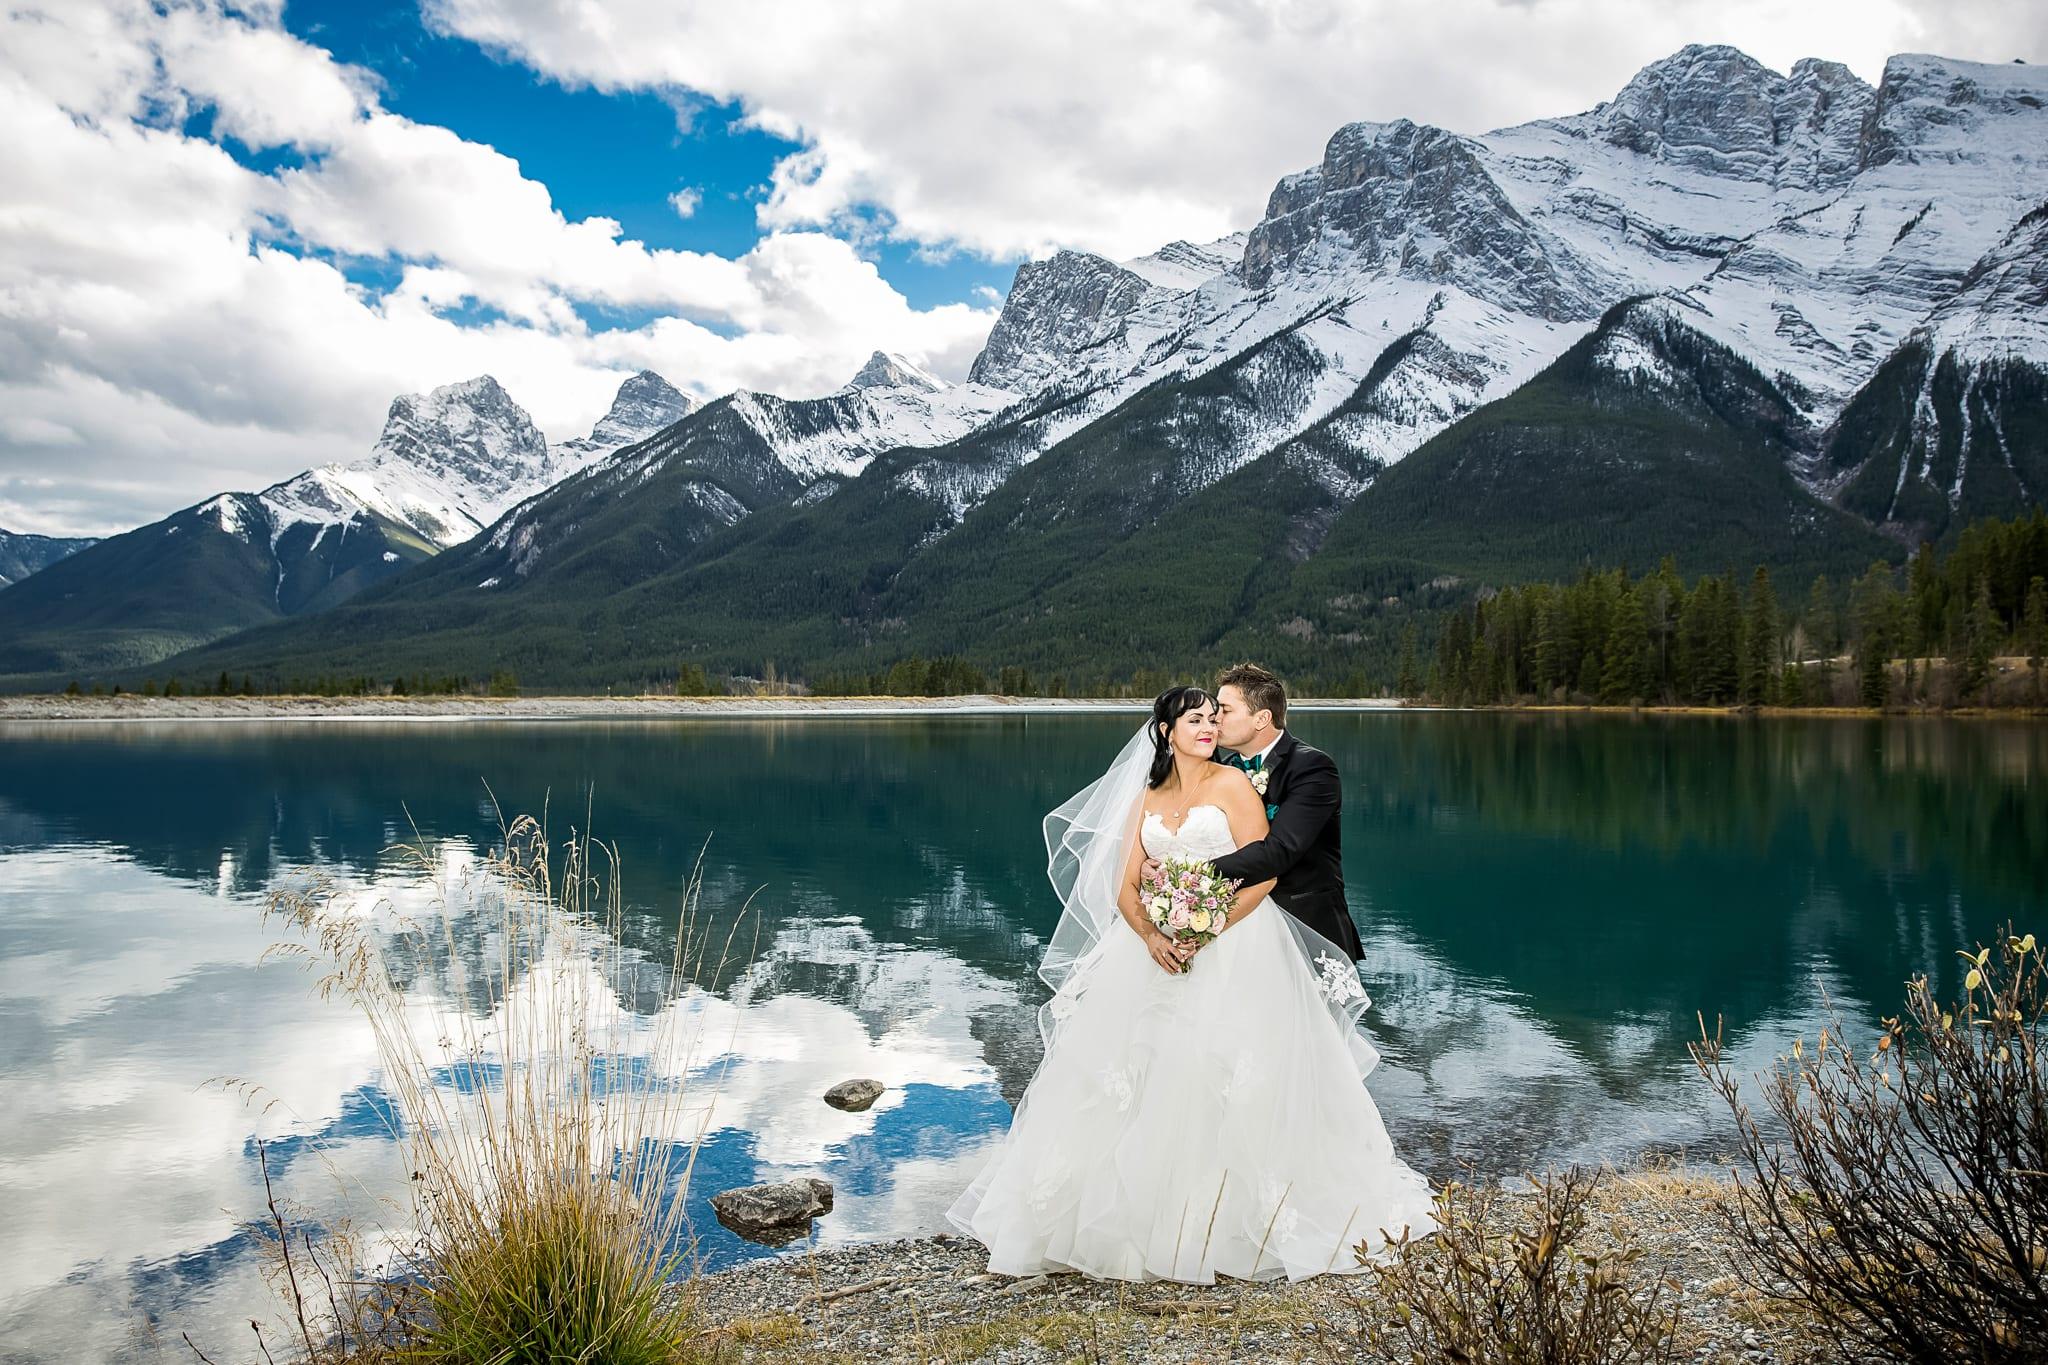 Canmore Wedding - Photo credit Kim Payant